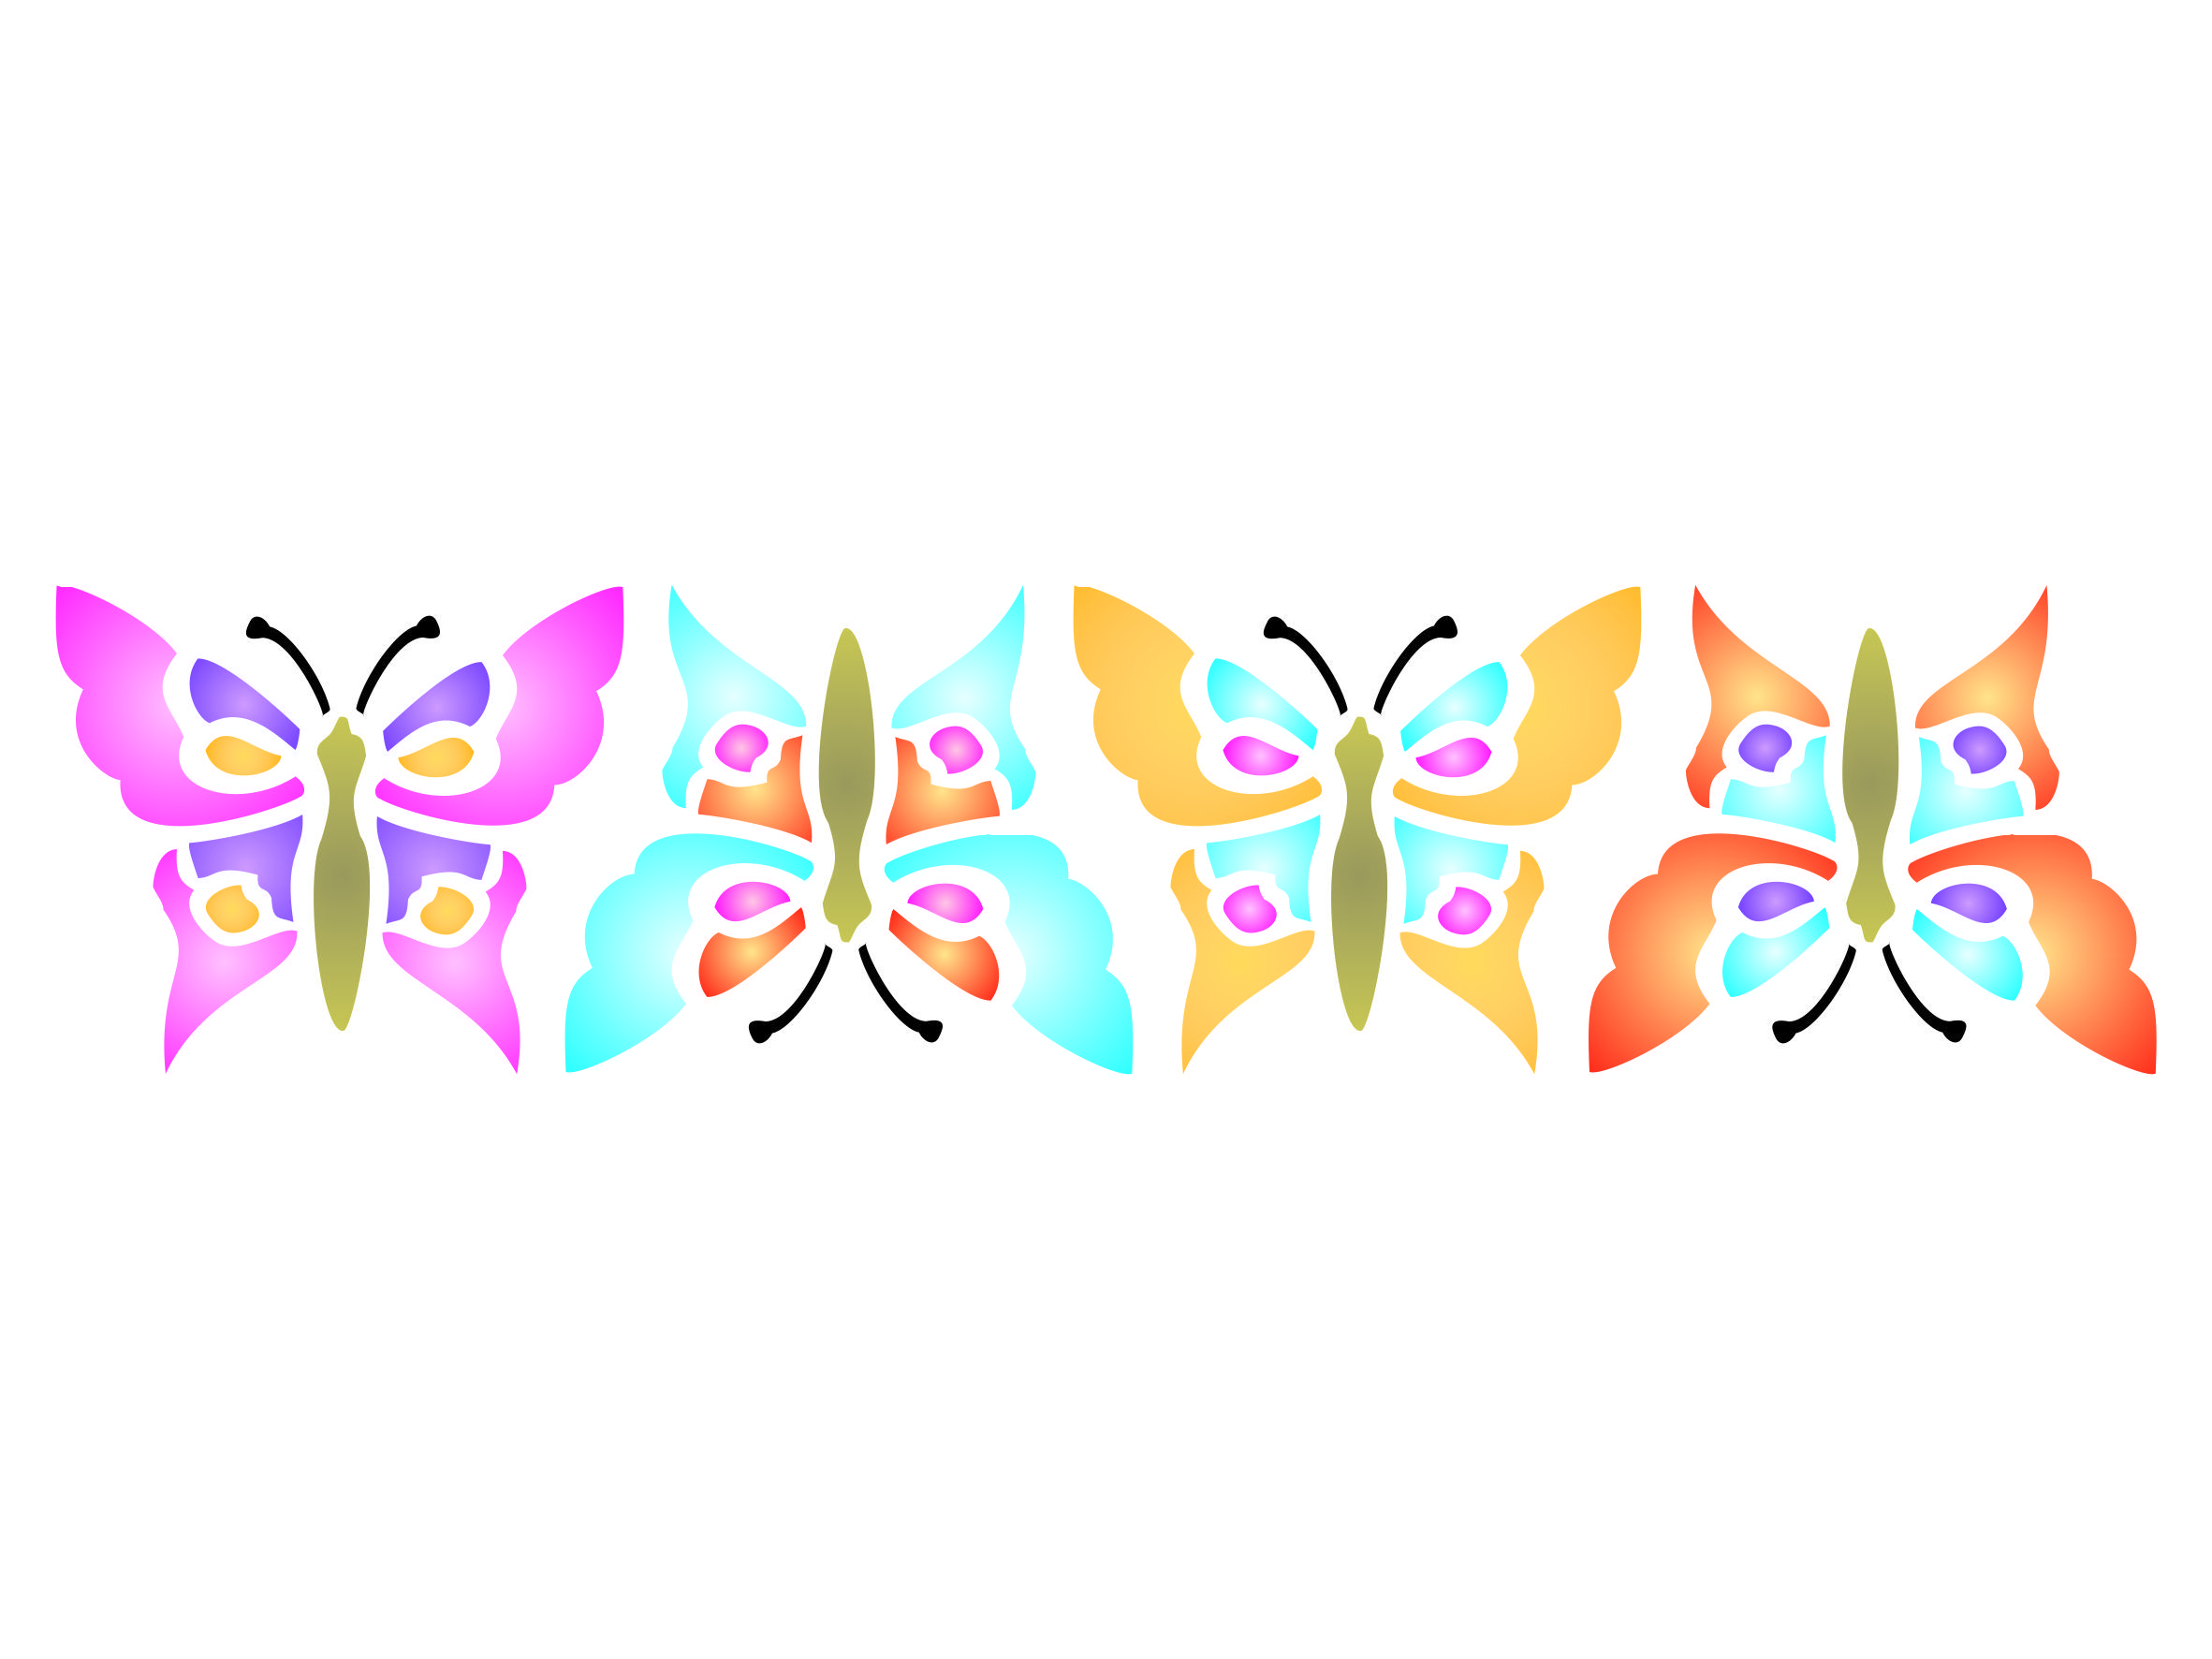 Butterfly wall border stencil httpamazondpb01d5z82aq butterfly wall border stencil httpamazondp amipublicfo Gallery